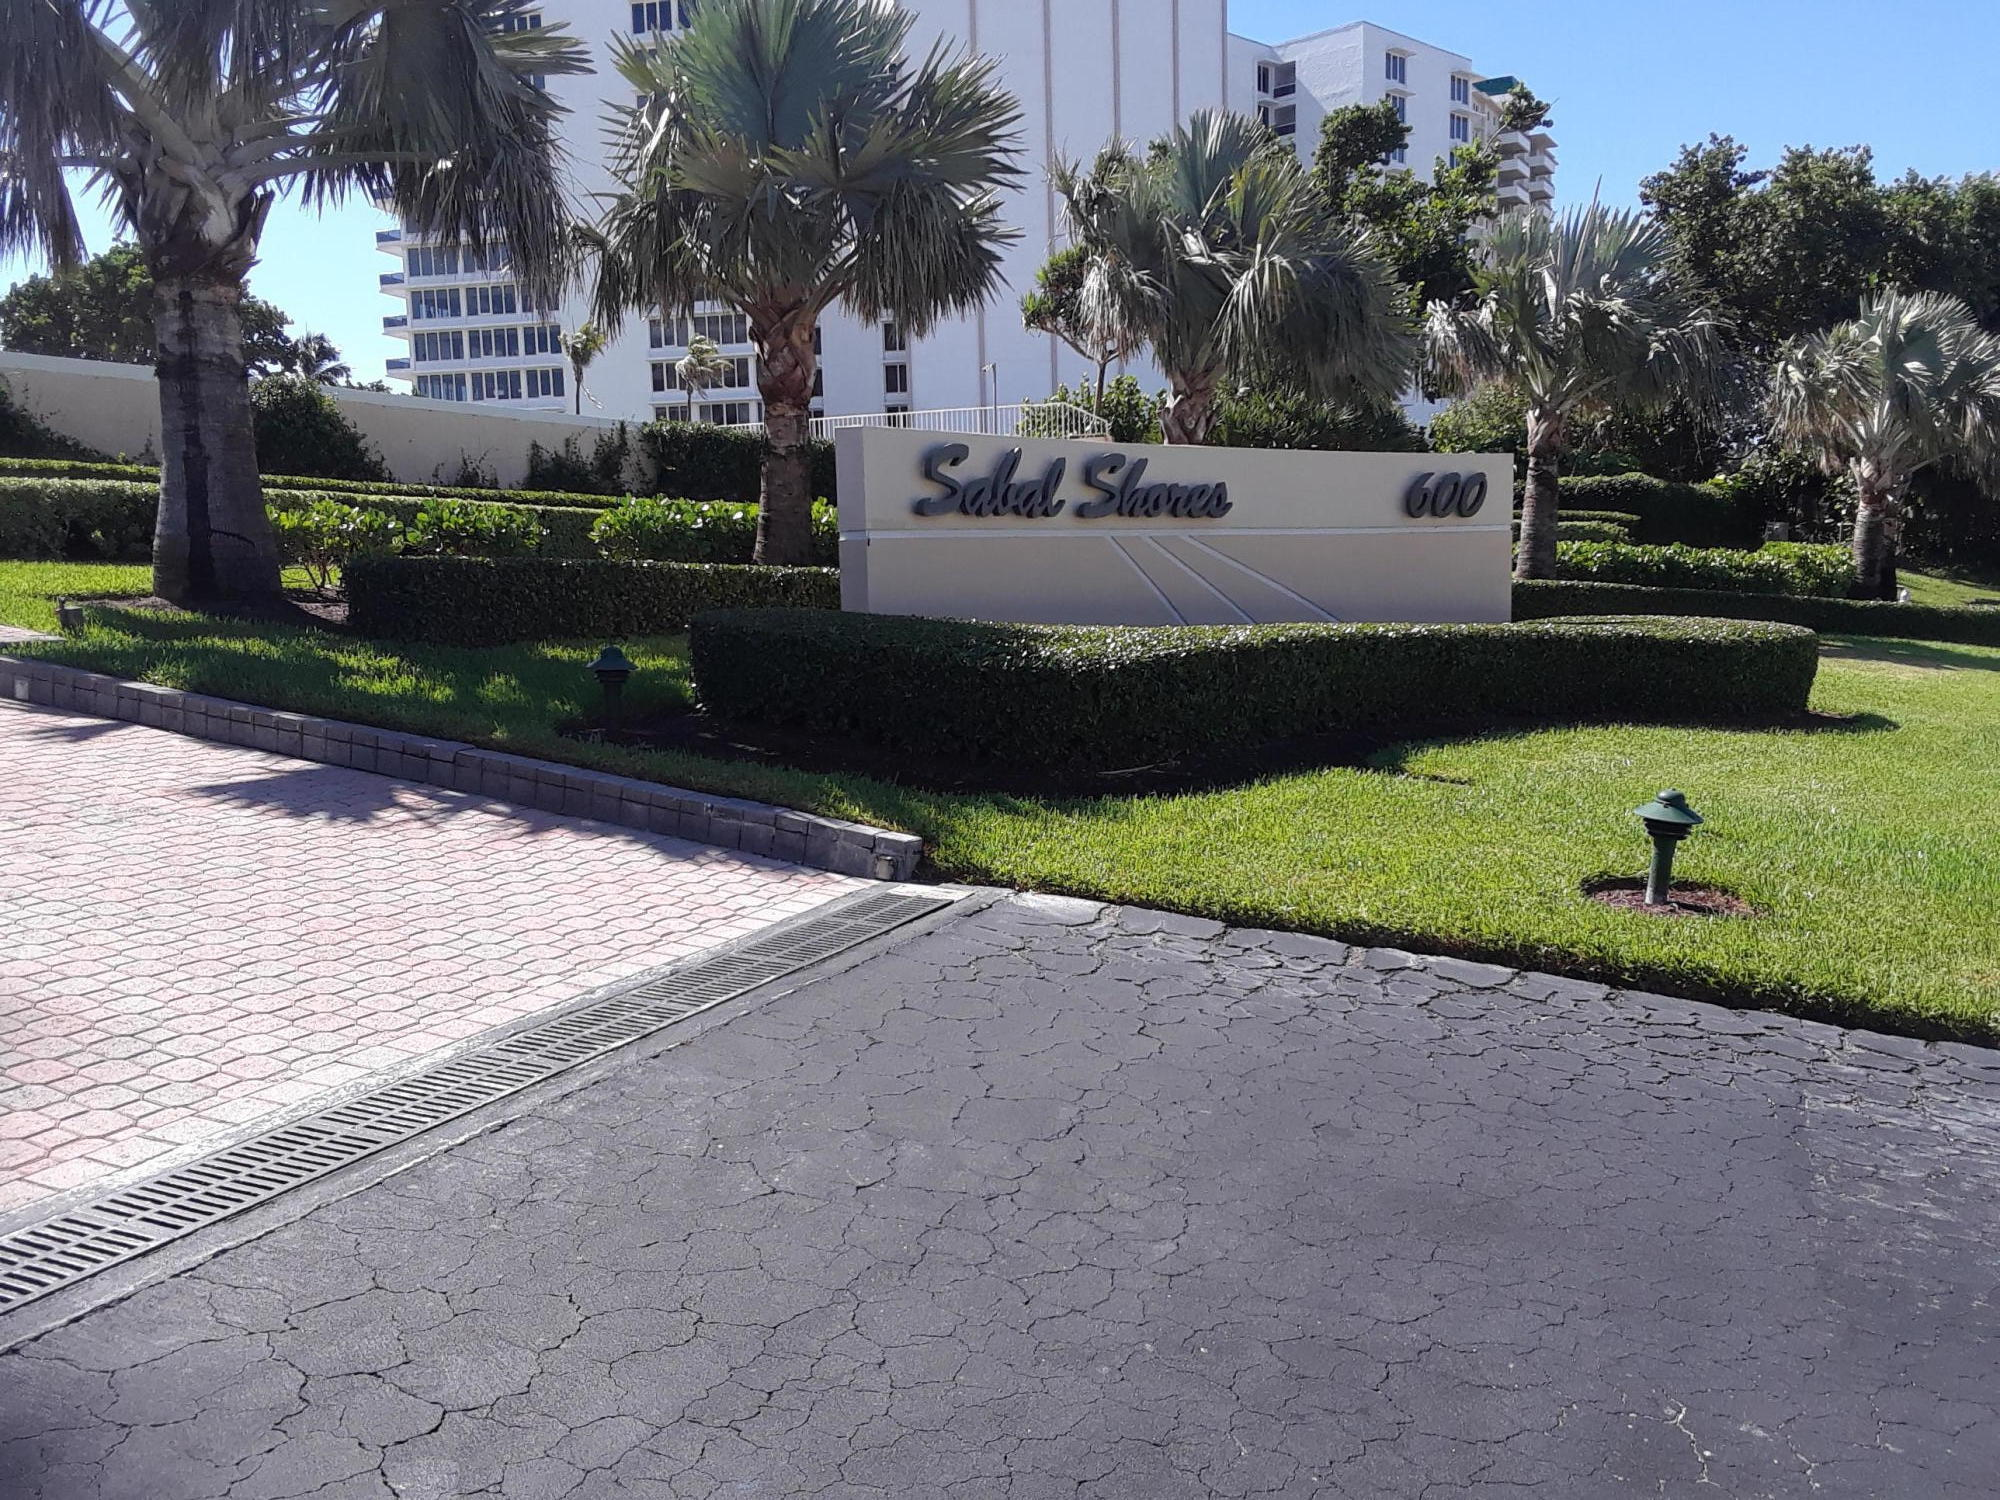 600 S Ocean Boulevard #104 Boca Raton, FL 33432